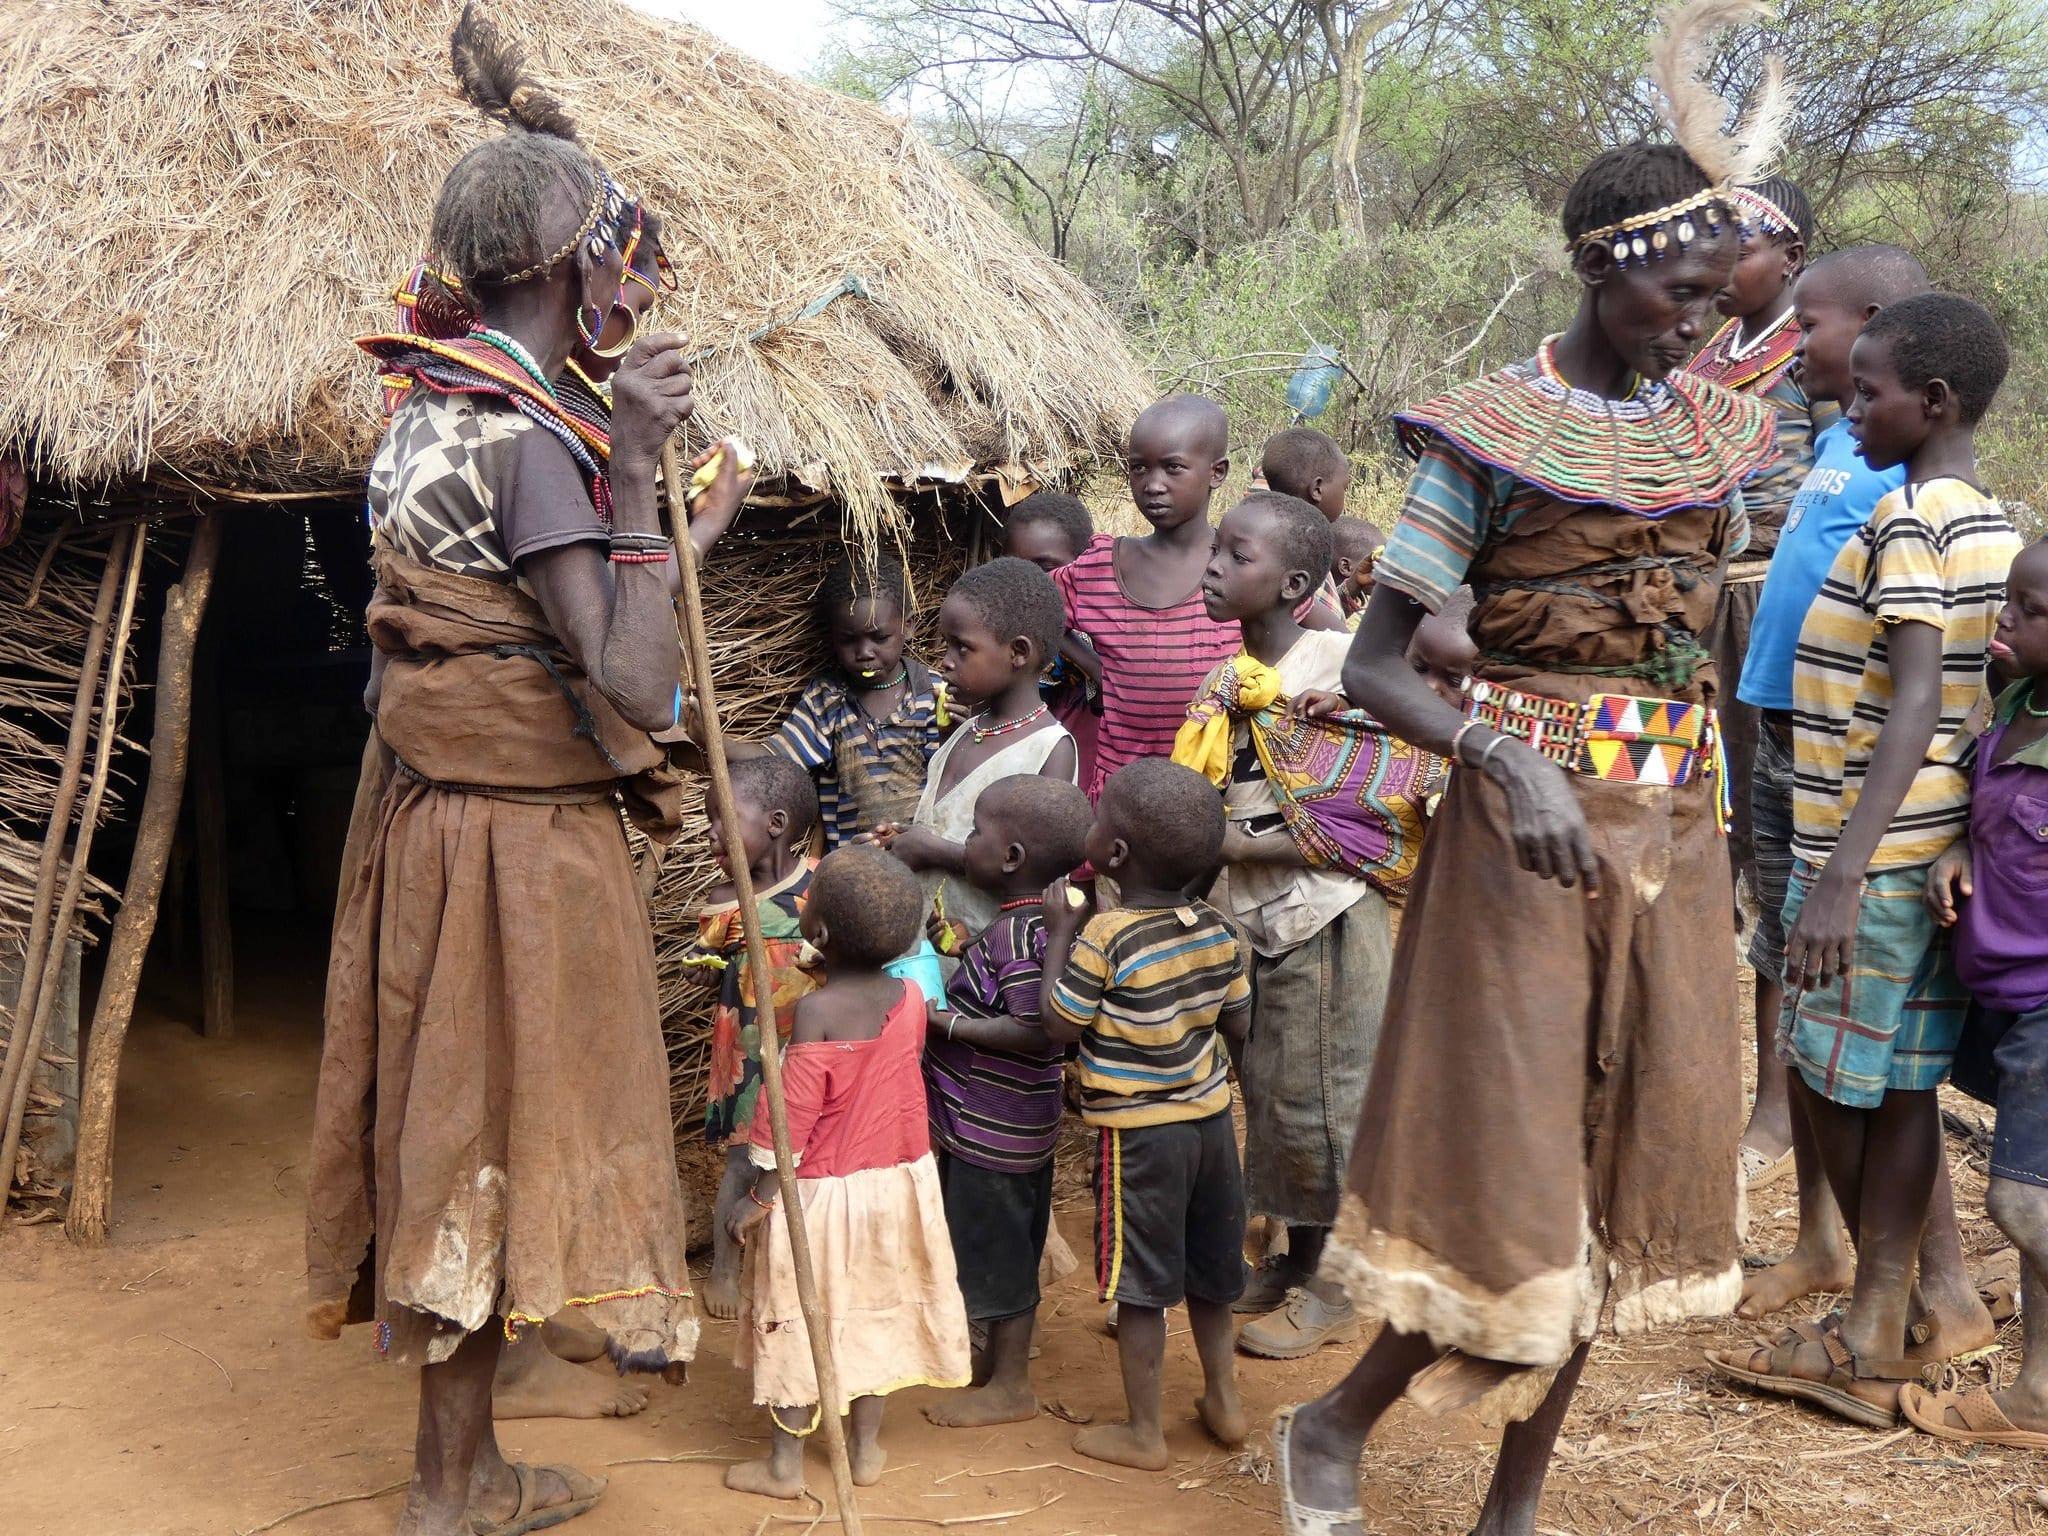 Kalenjin Tribe